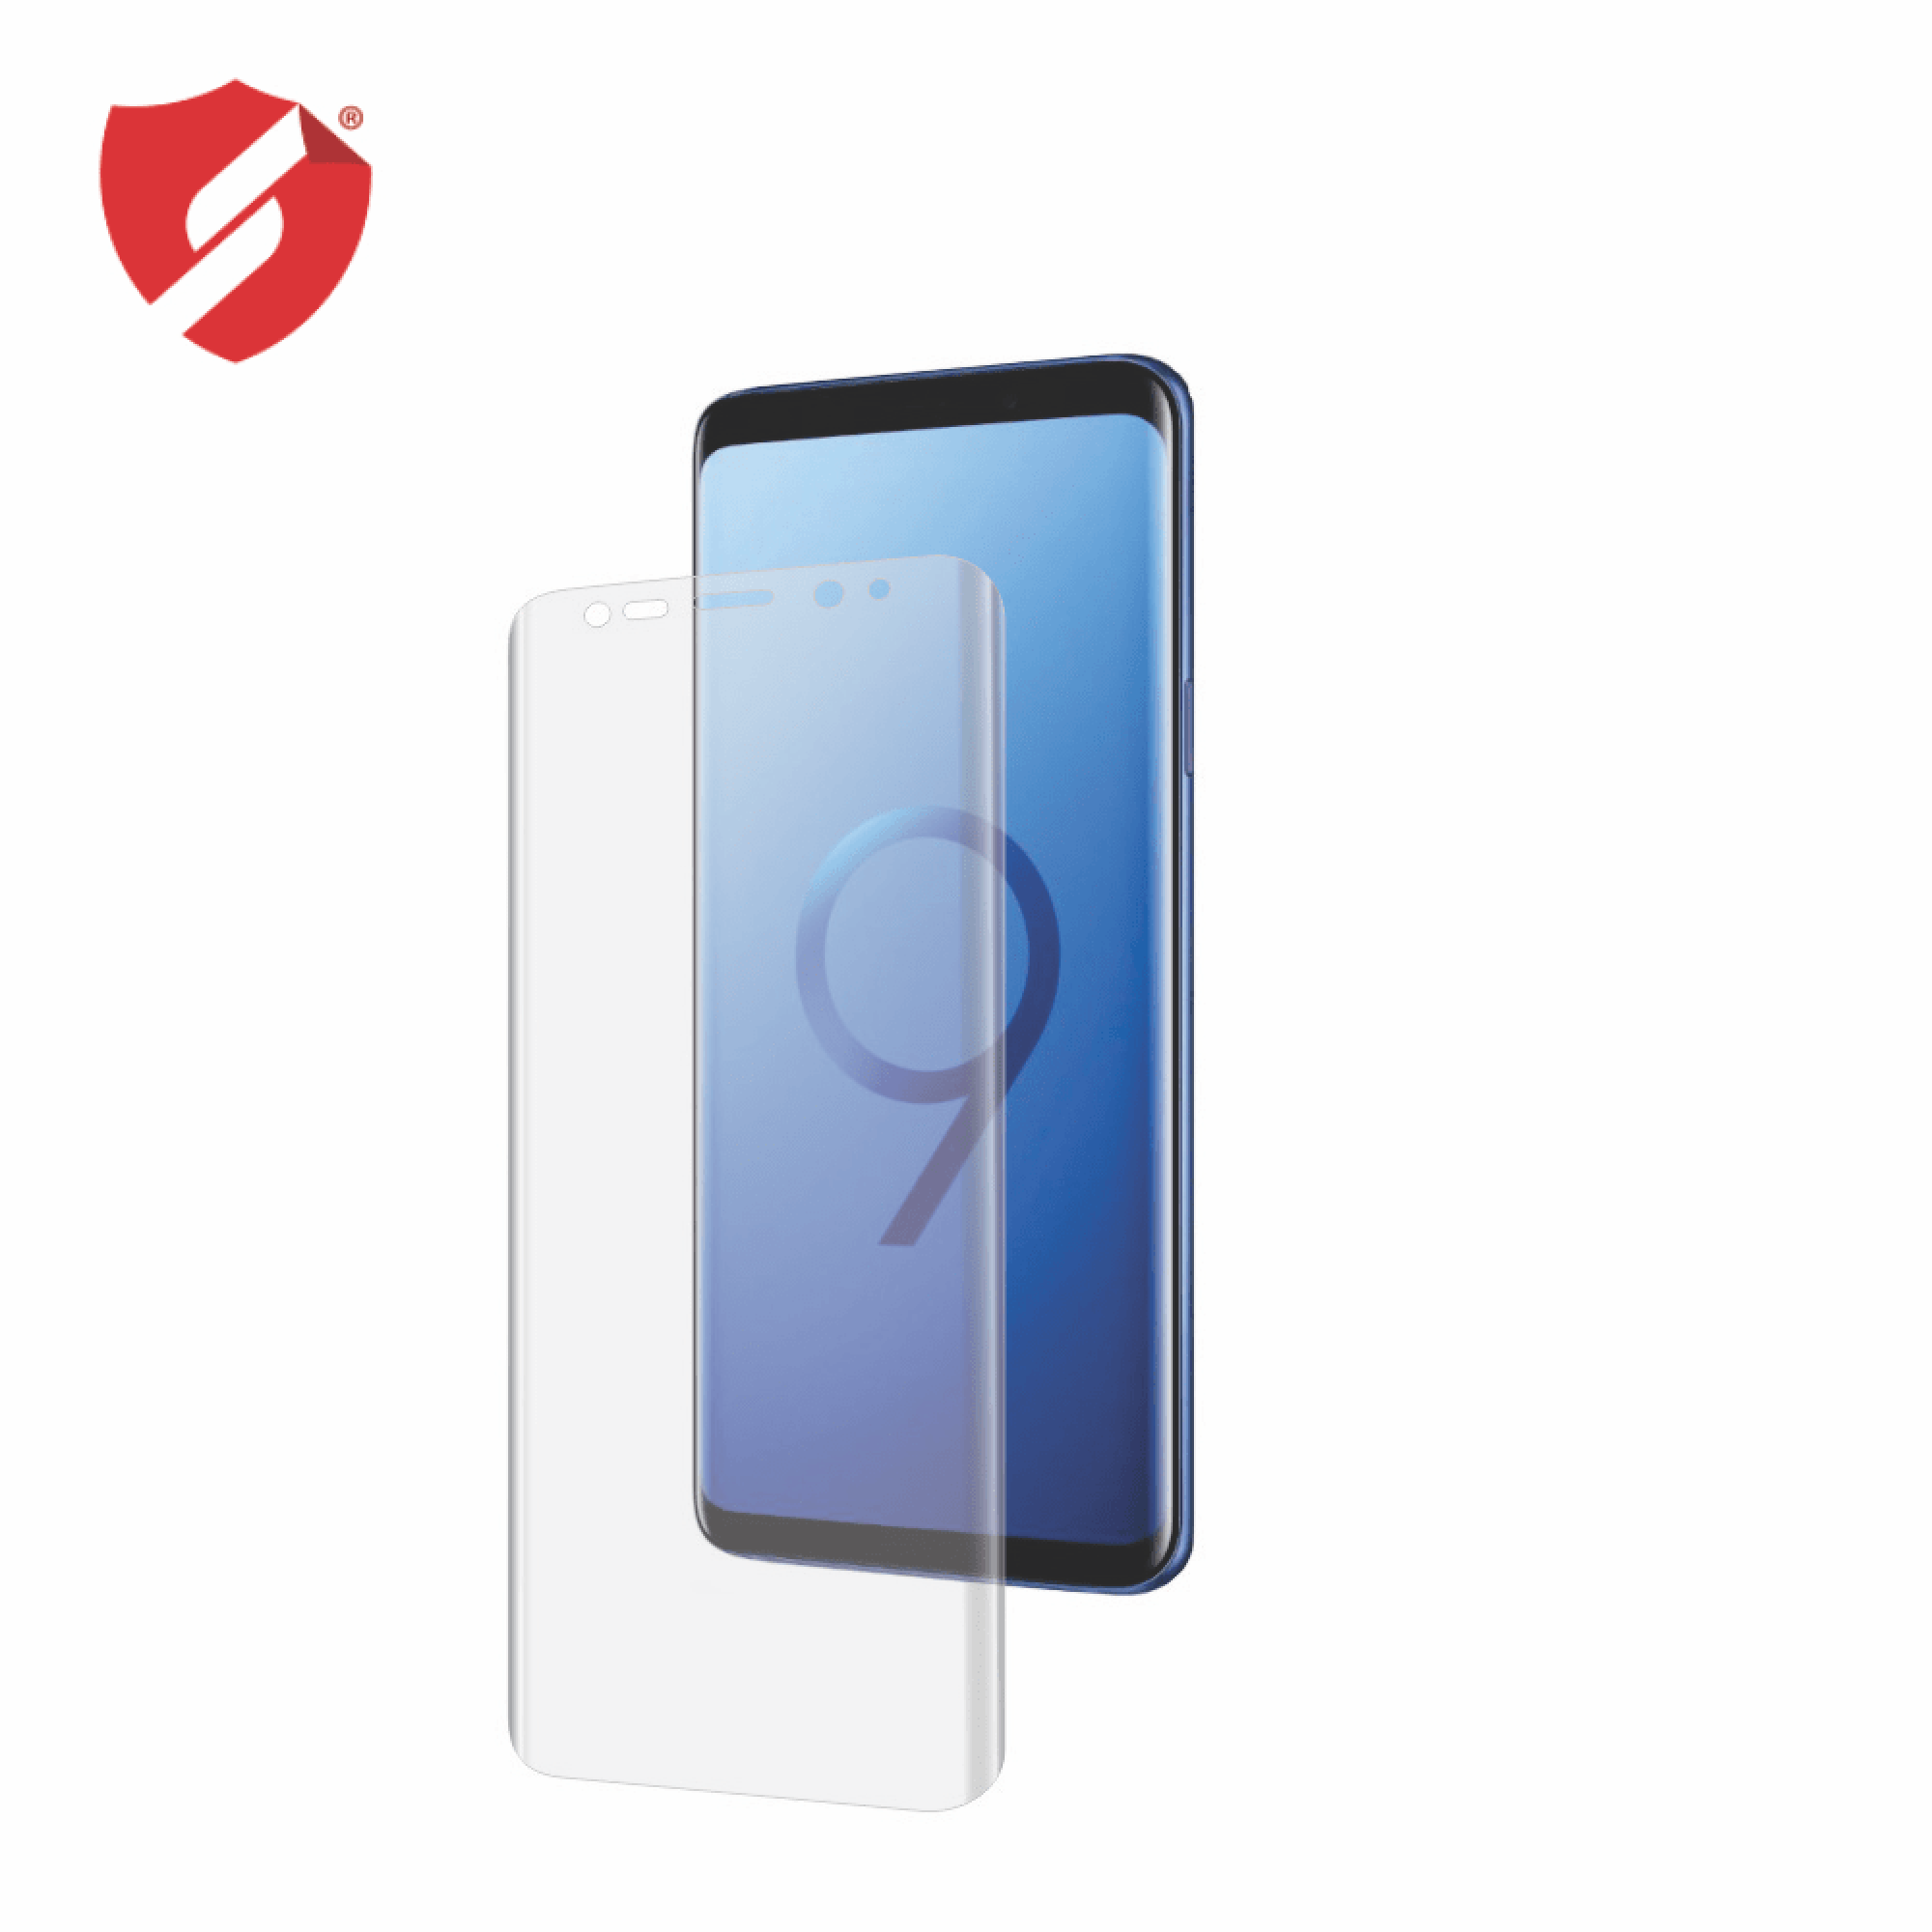 Folie de protectie Smart Protection Samsung Galaxy S9 Plus compatibila cu carcasa UAG - doar-display imagine